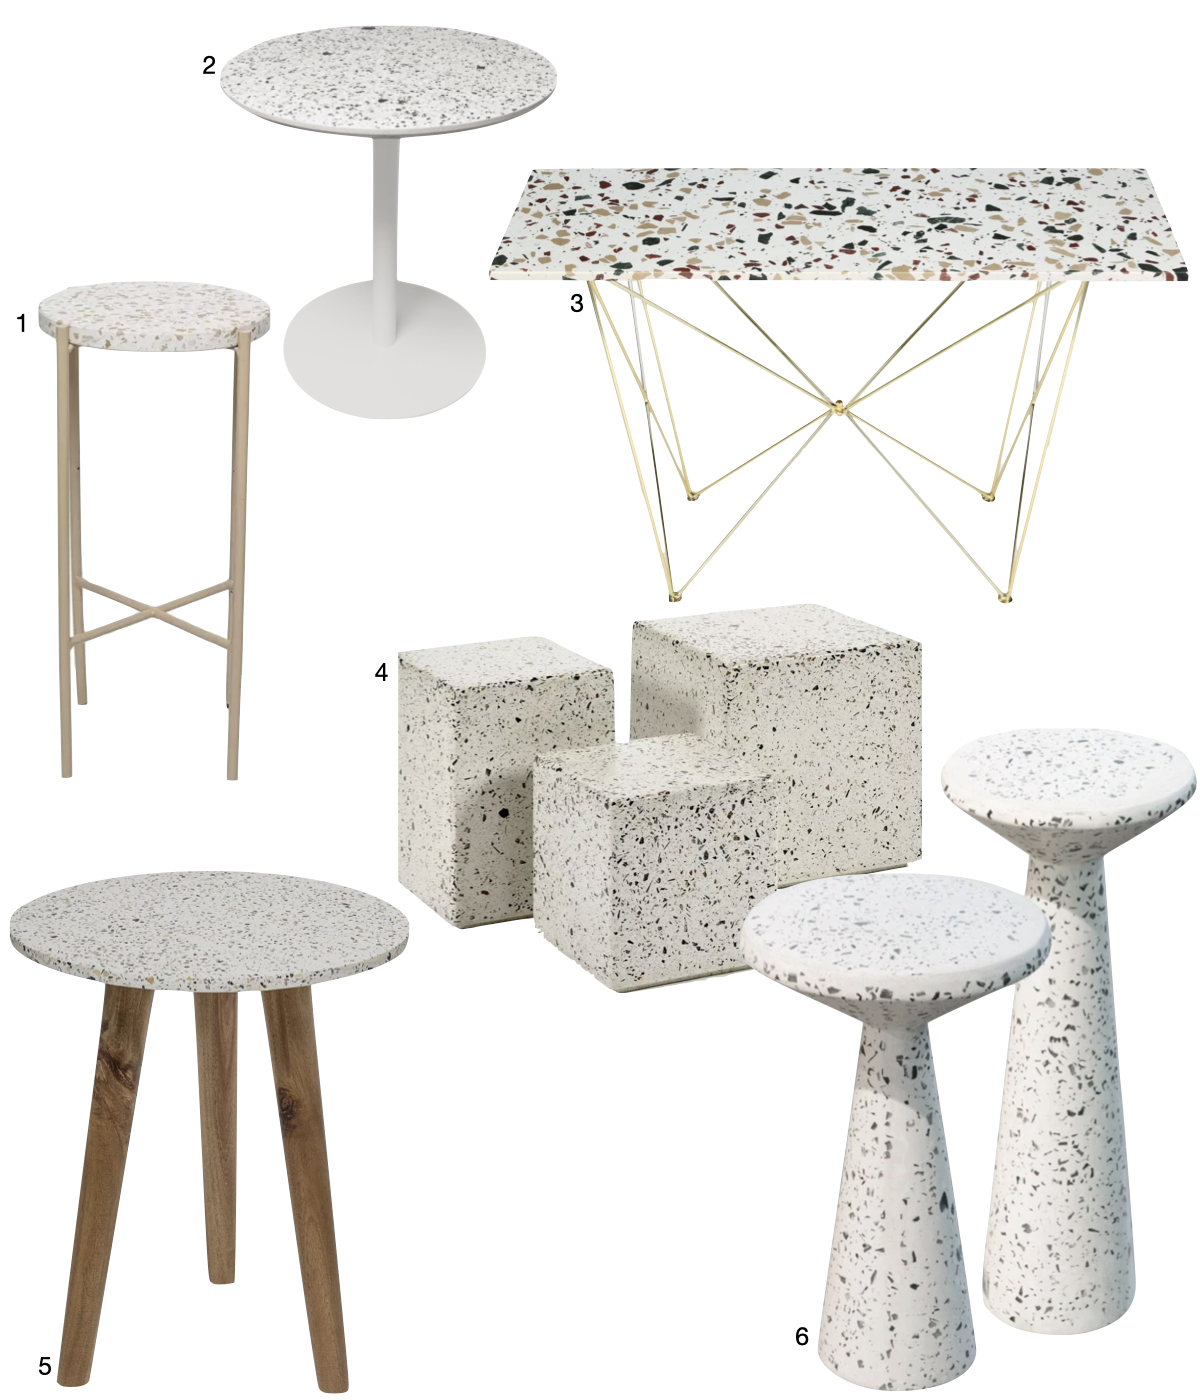 table ronde carrée rectangle granito terrazzo blanc pieds bois béton laiton